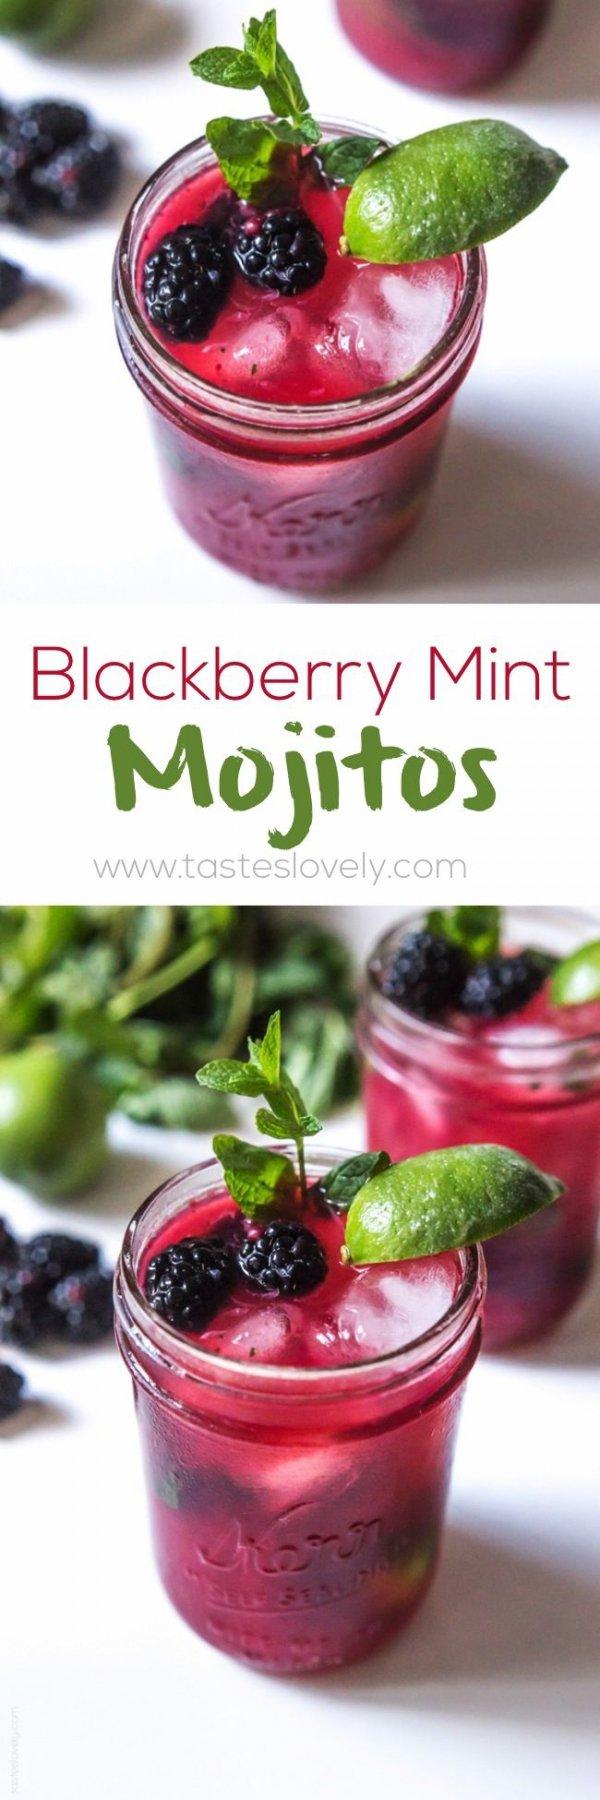 Blackberry Mint Mojitos